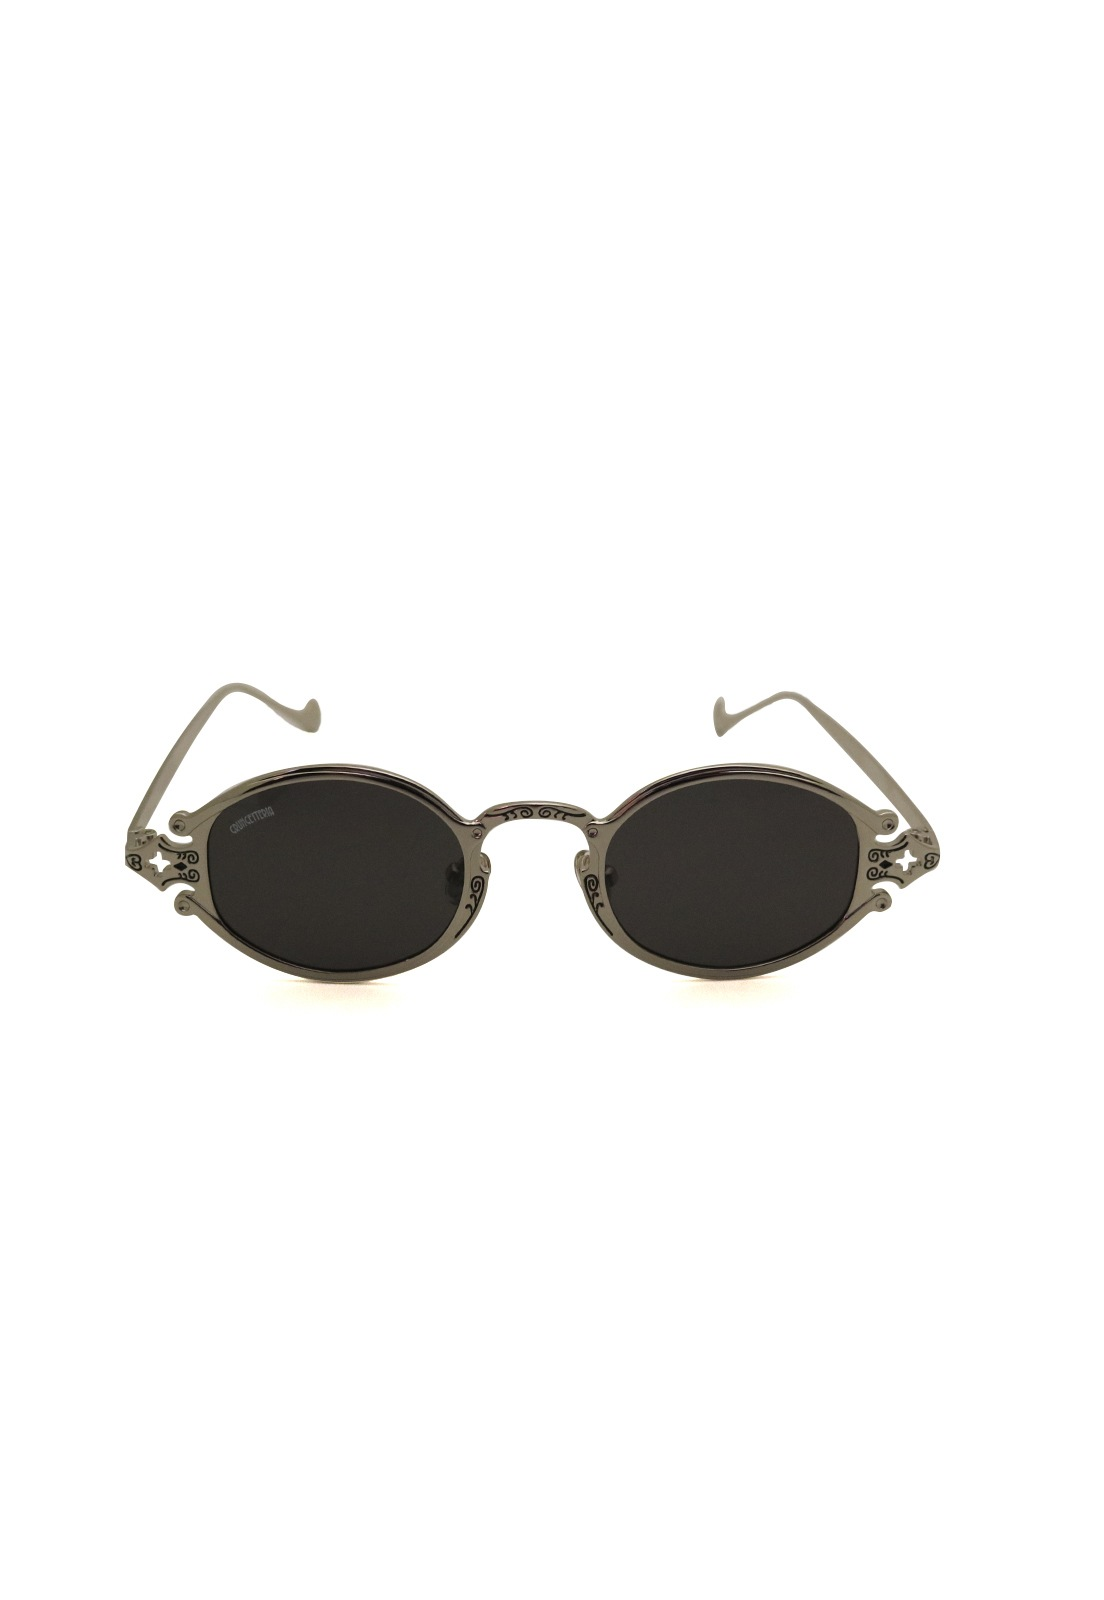 Óculos de Sol Grungetteria Sacro Prata